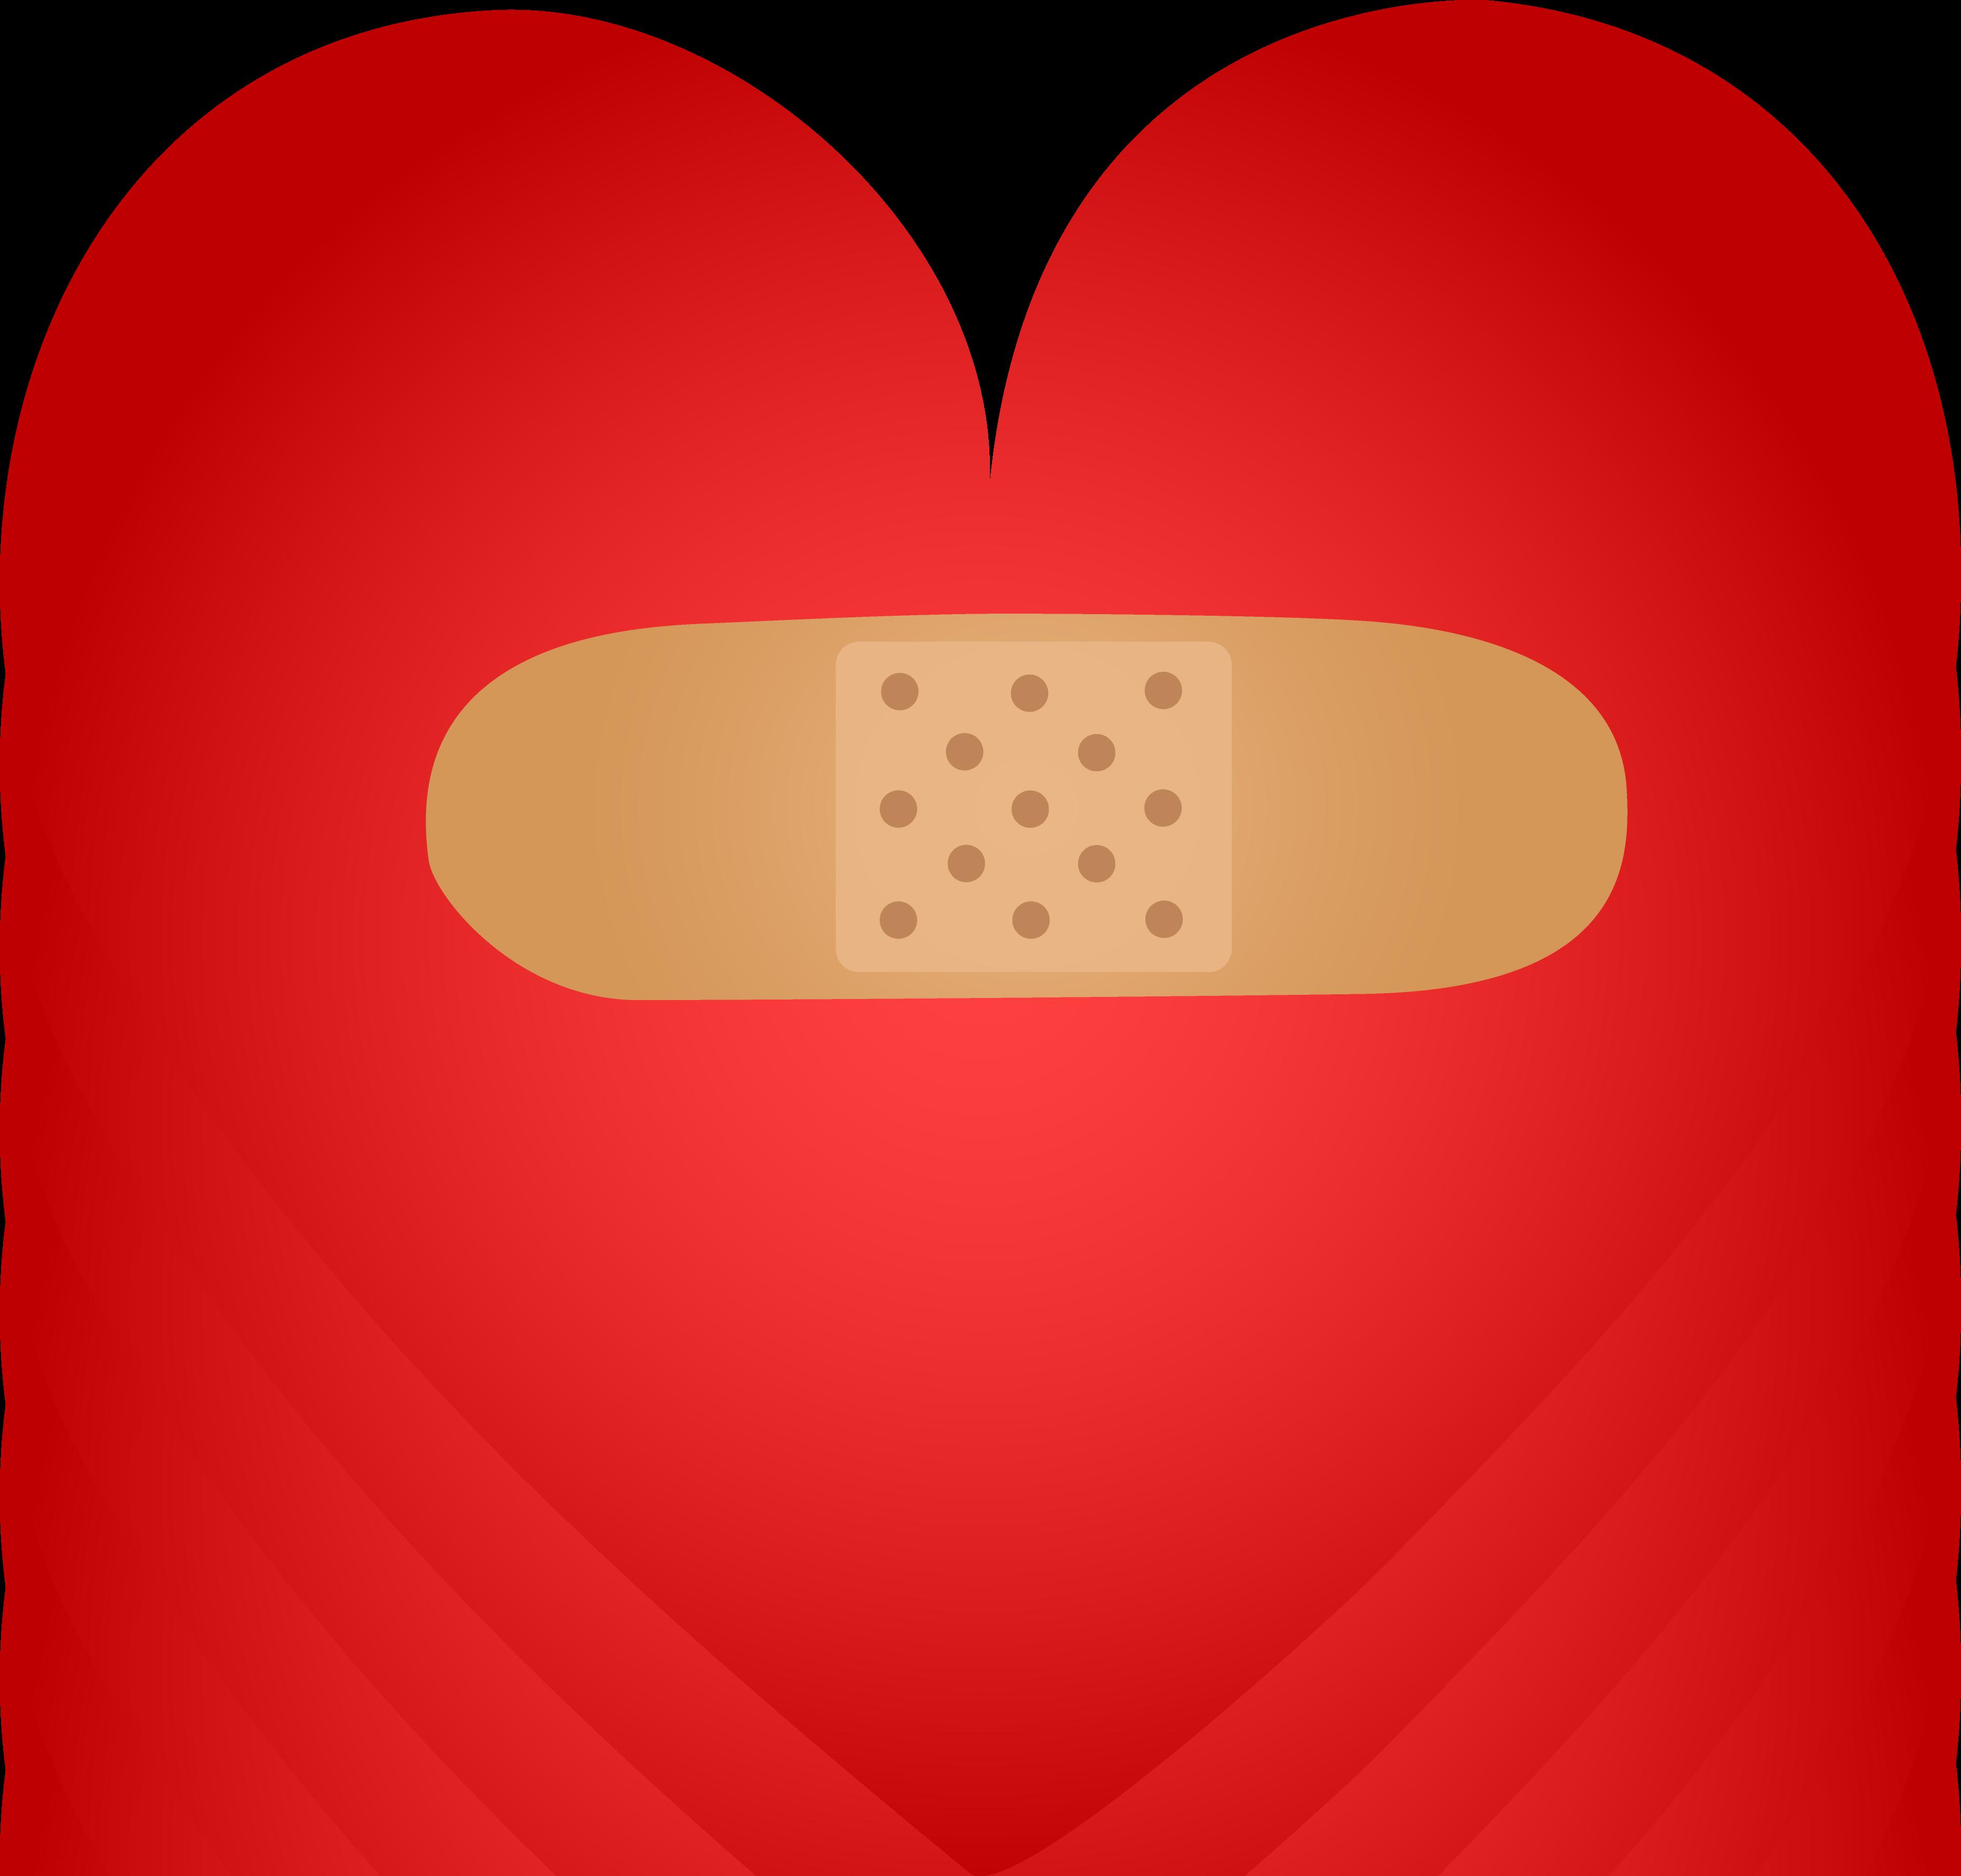 Healing clipart broken heart Aid Bandaid Heart Mended Band